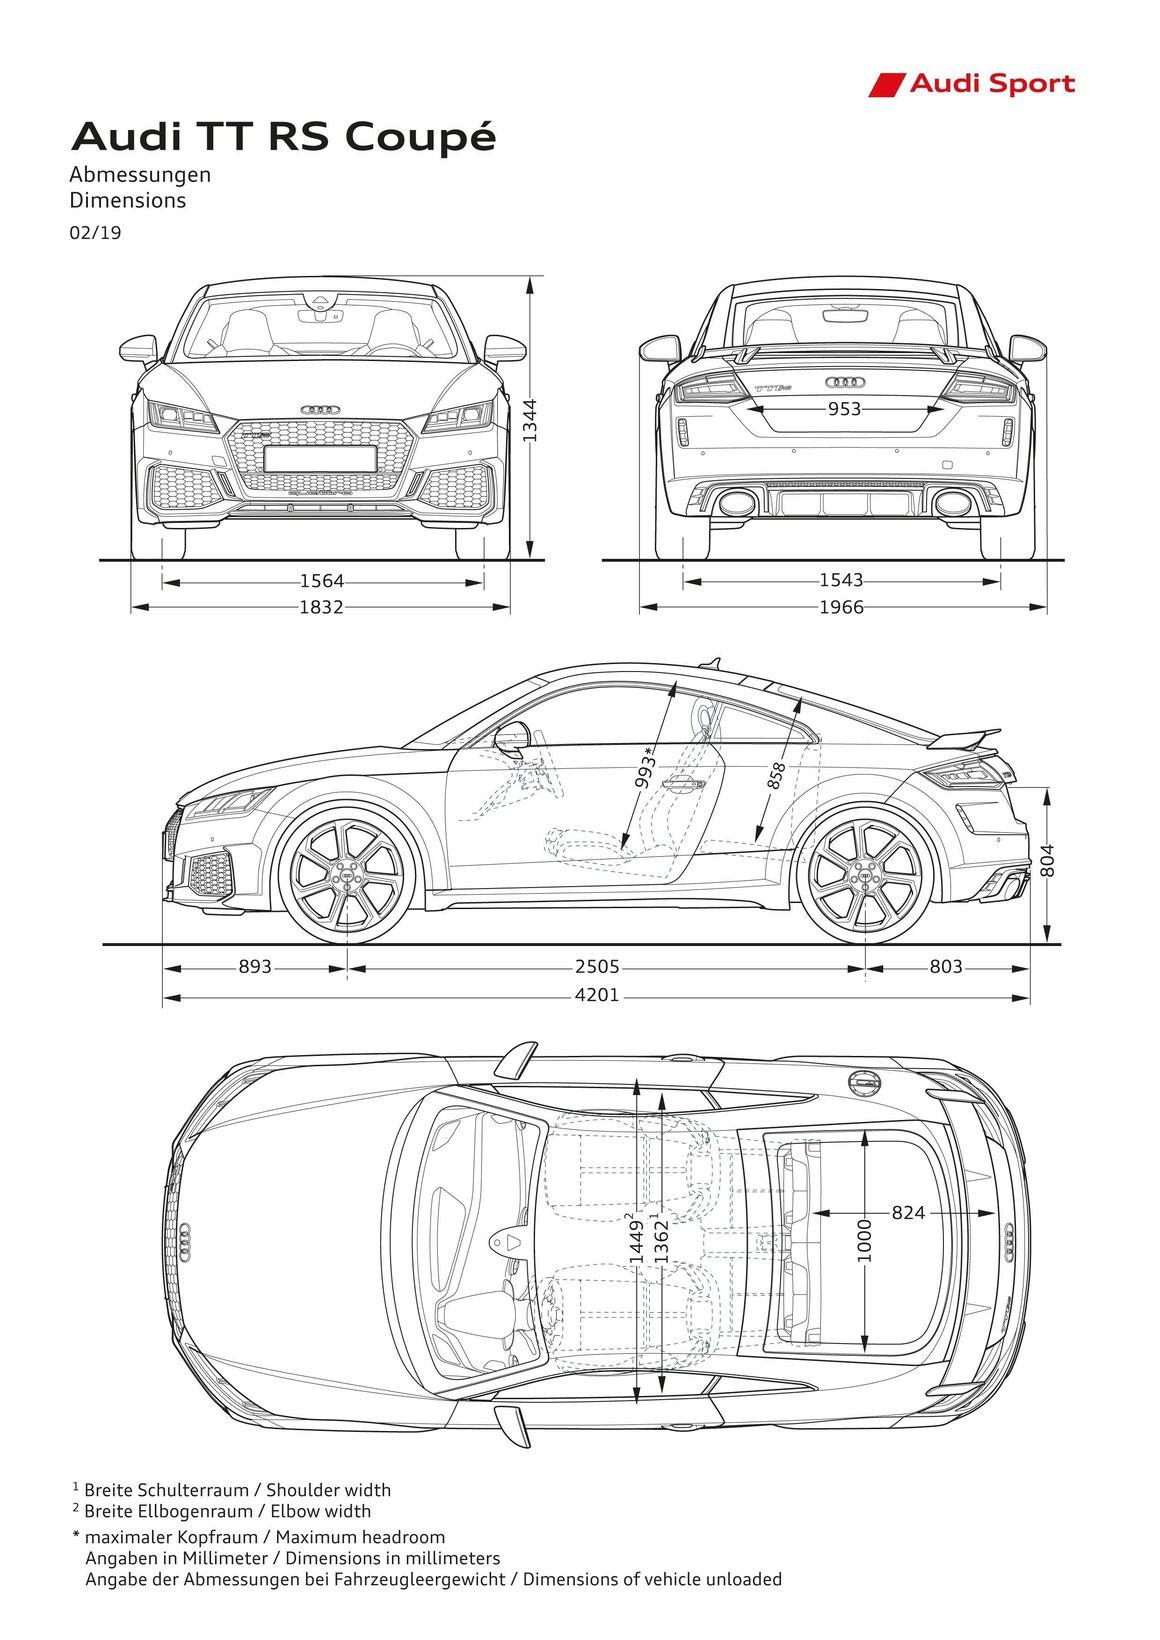 Audi Tt Rs Coupe Audi Mediacenter